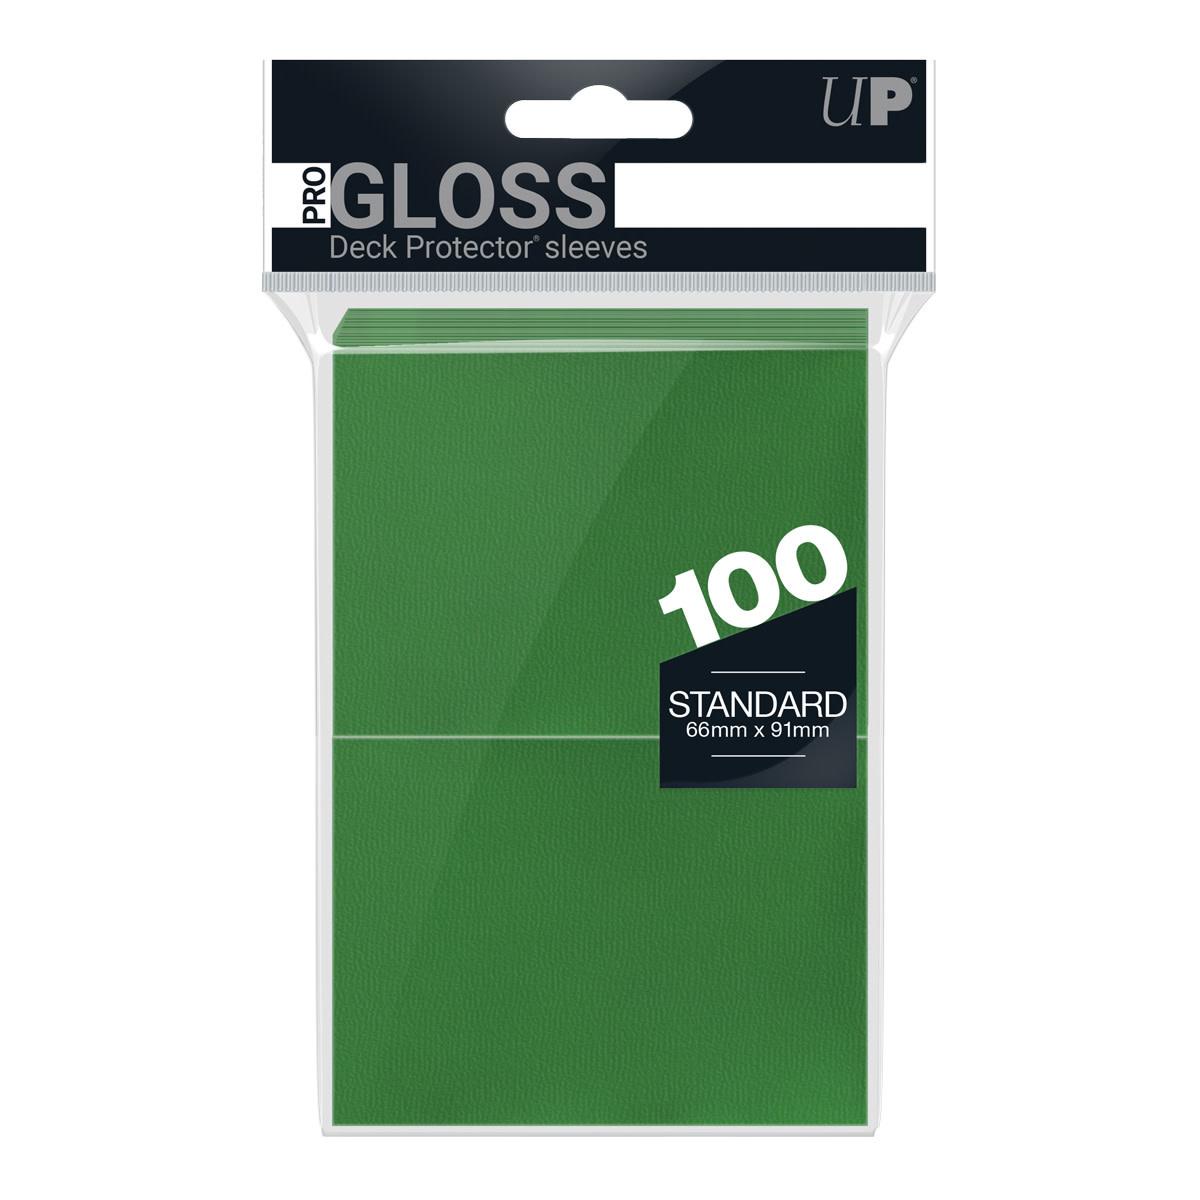 Standard Deck Protector Sleeves - Green (100ct)